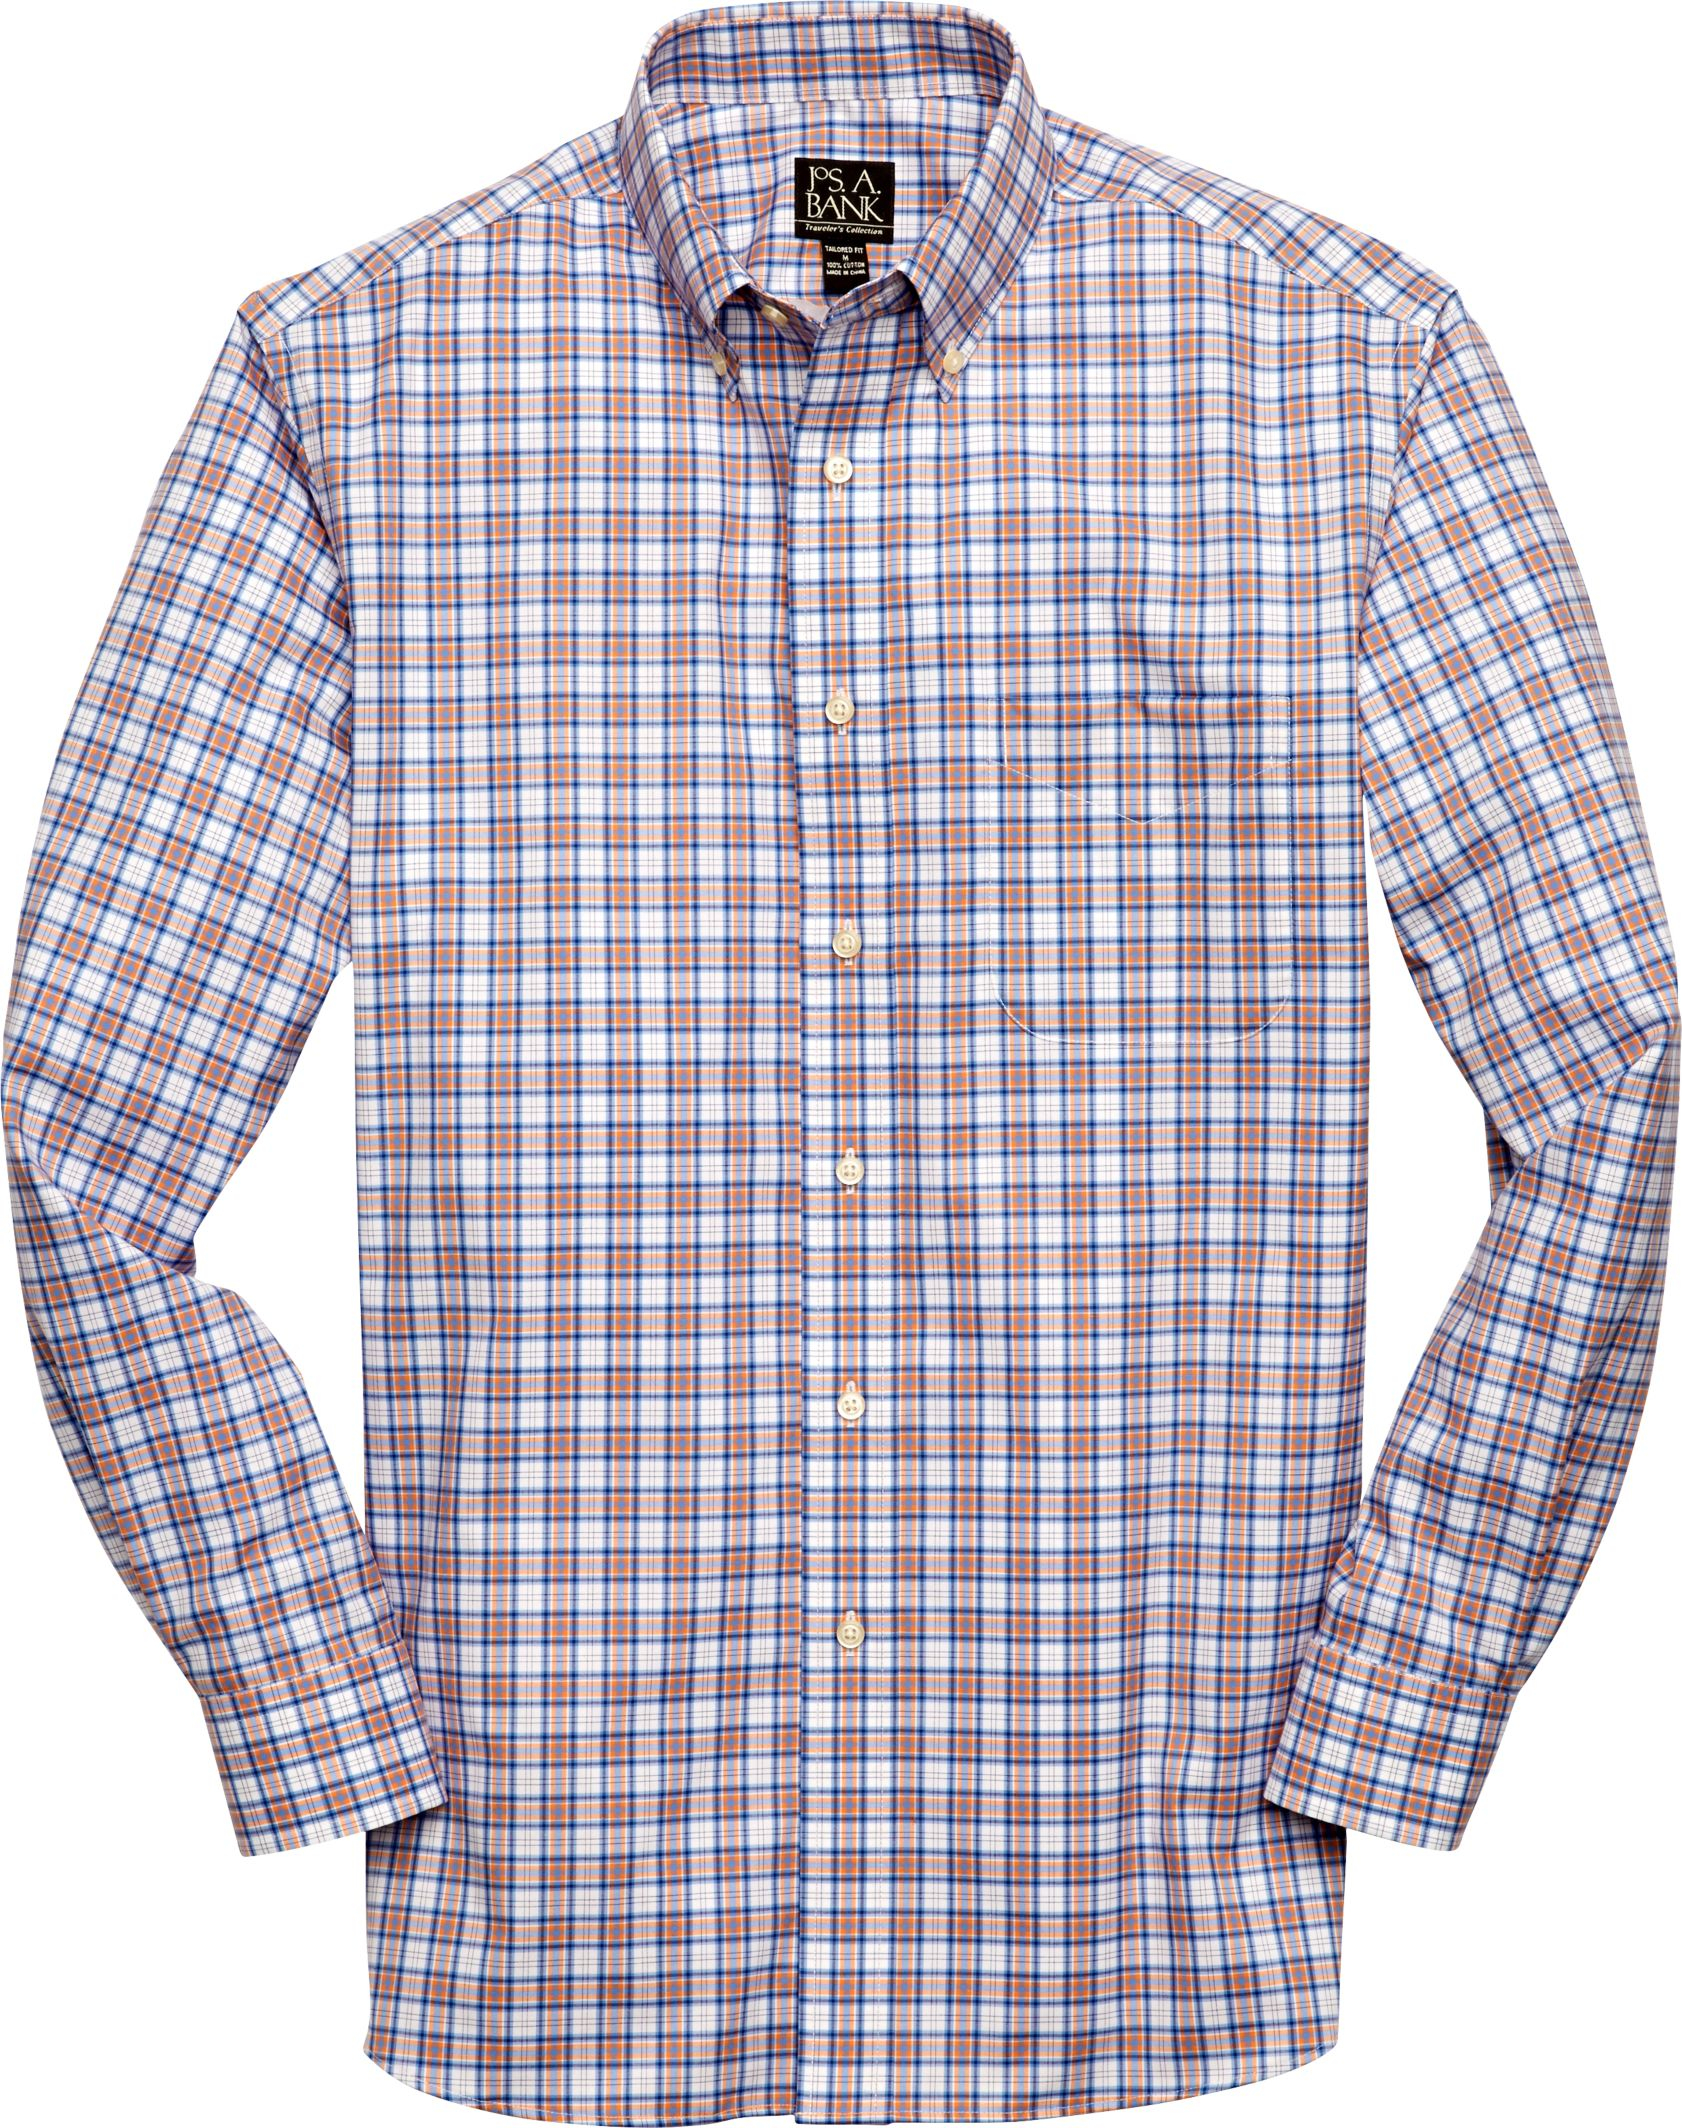 Jos a bank traveler tailored fit long sleeve sportshirt for Jos a bank tailored fit vs slim fit shirts